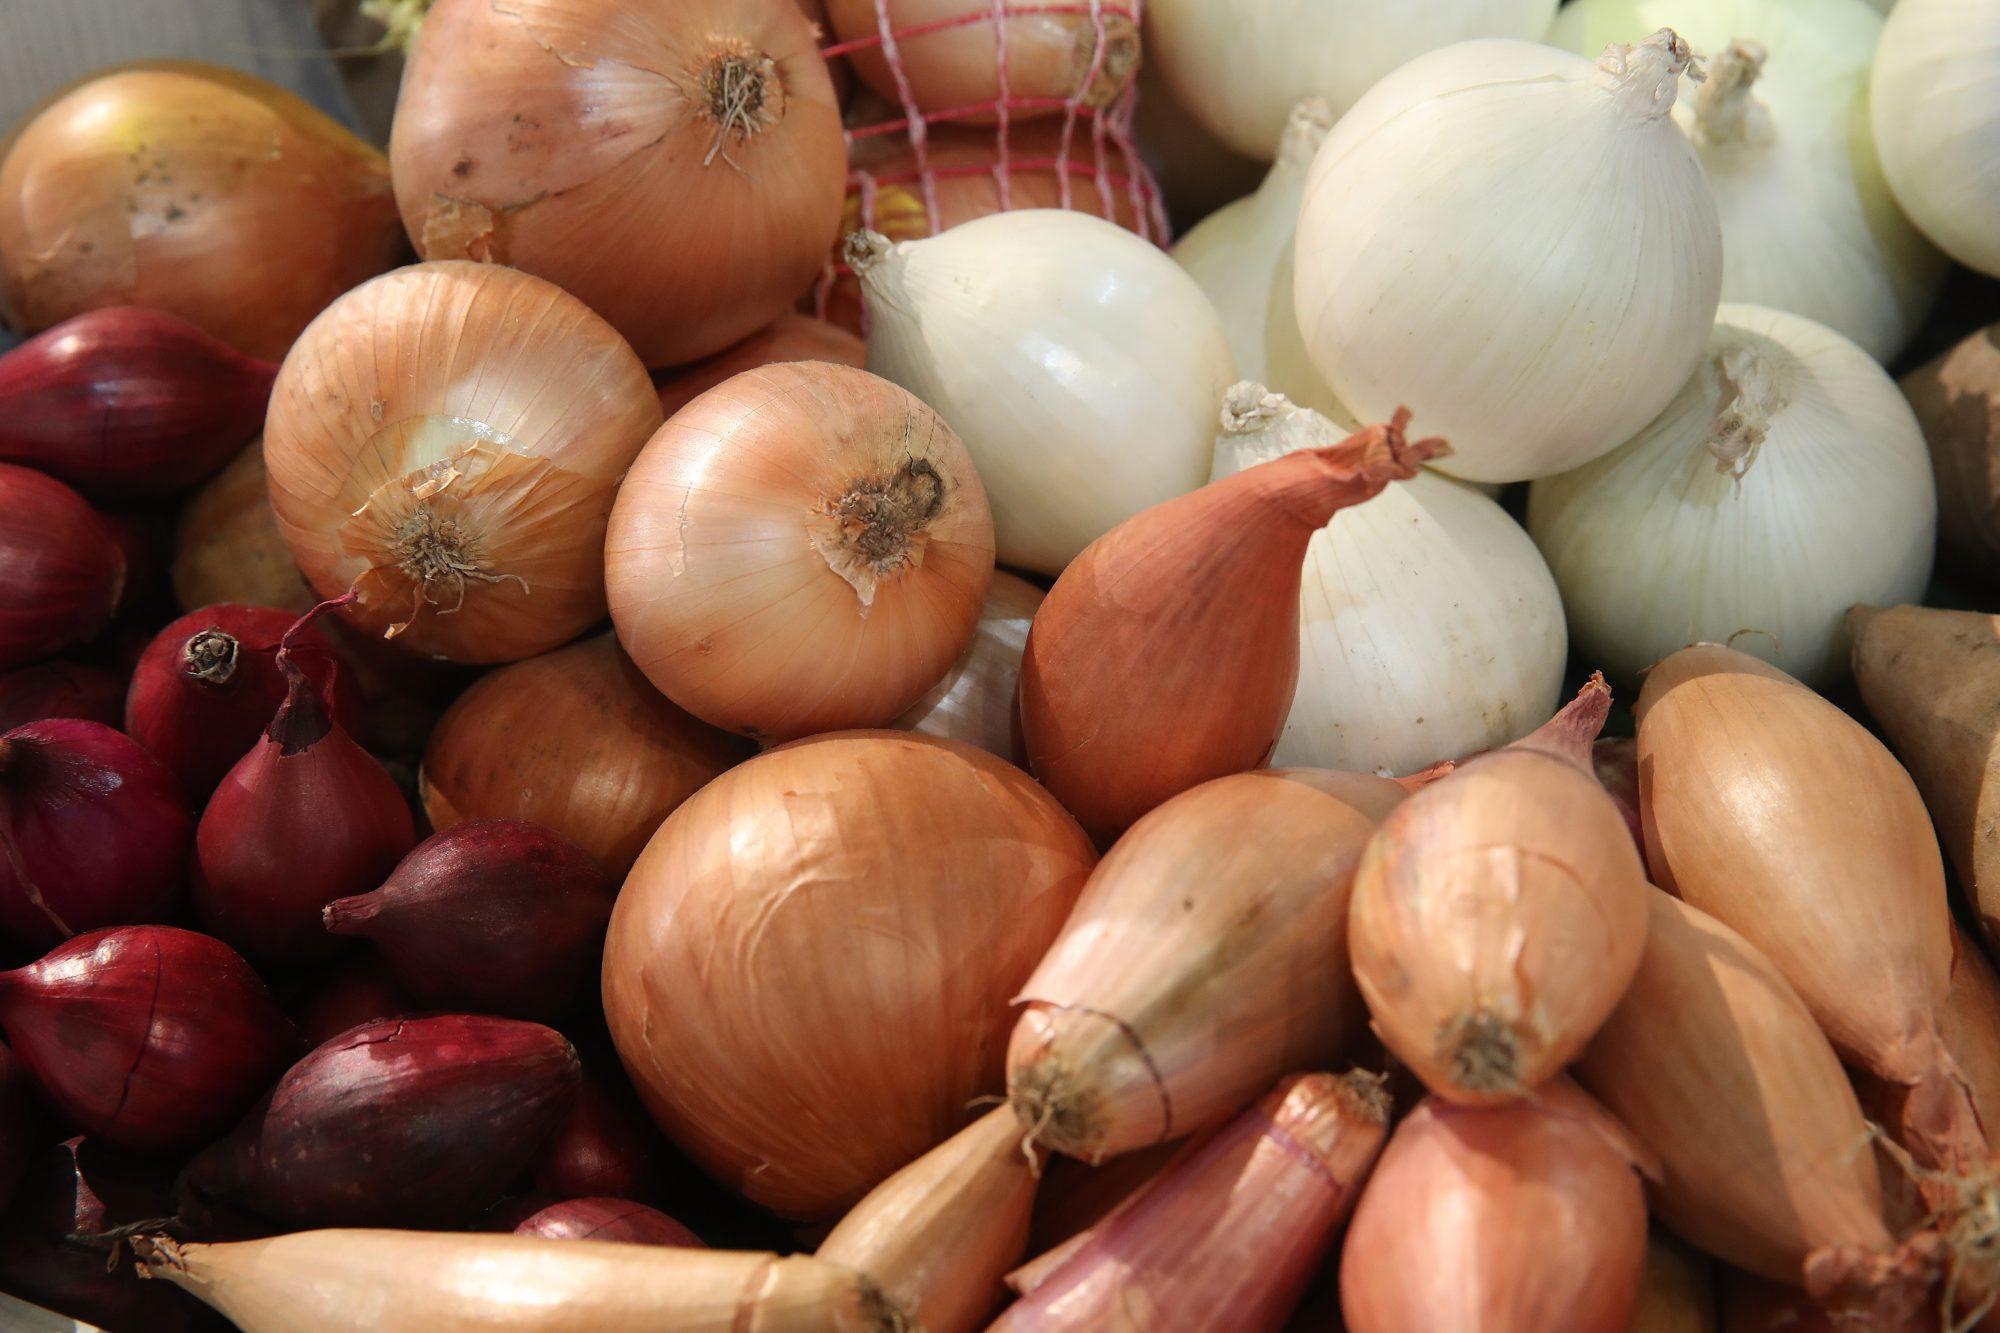 082520_Onion varieties